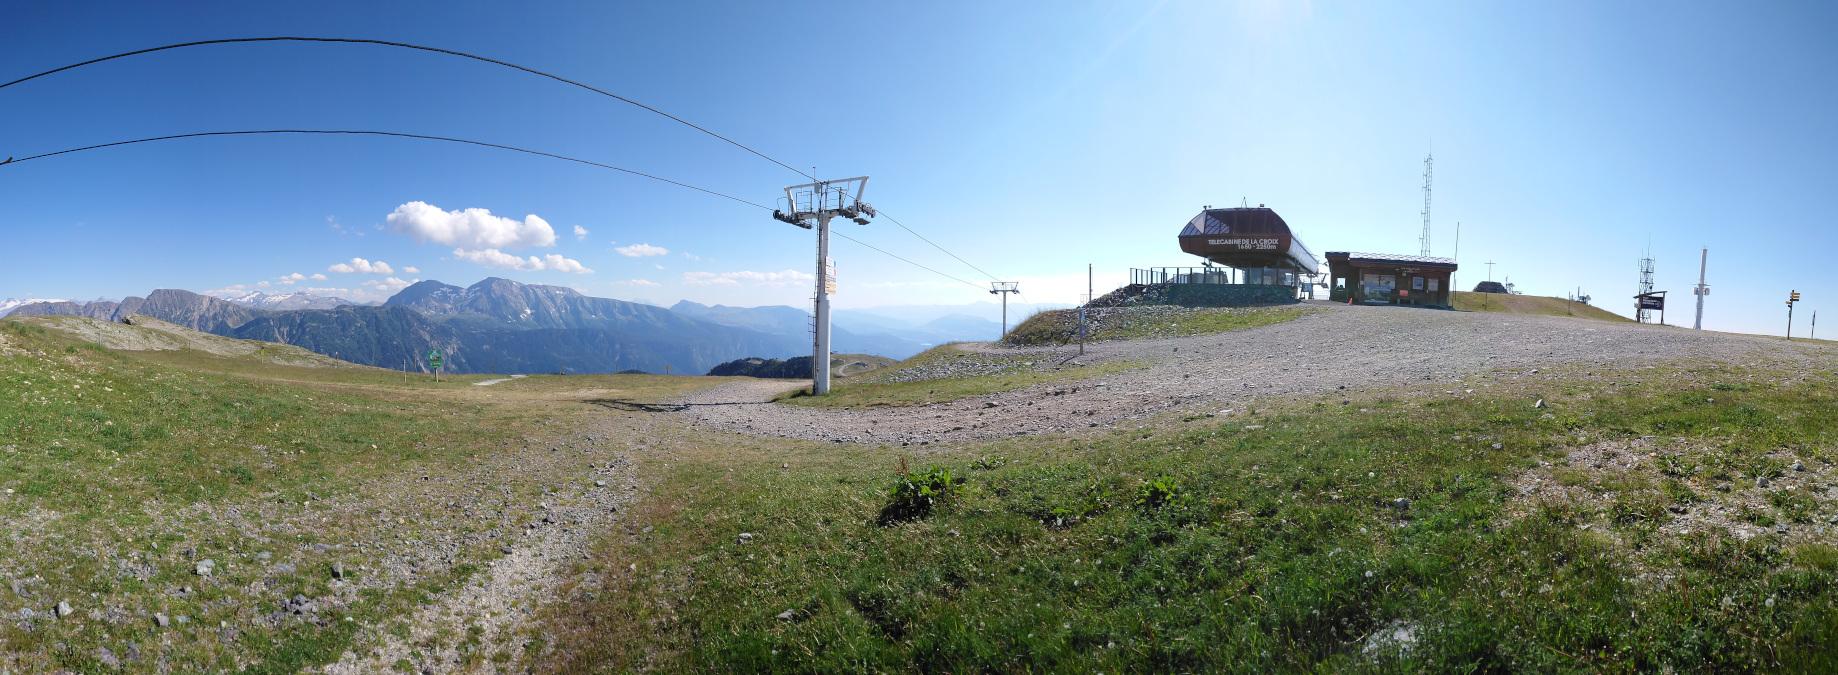 Chamrousse via ferrata mountain panoramic view summer resort grenoble isere french alps france - © SD - OT Chamrousse